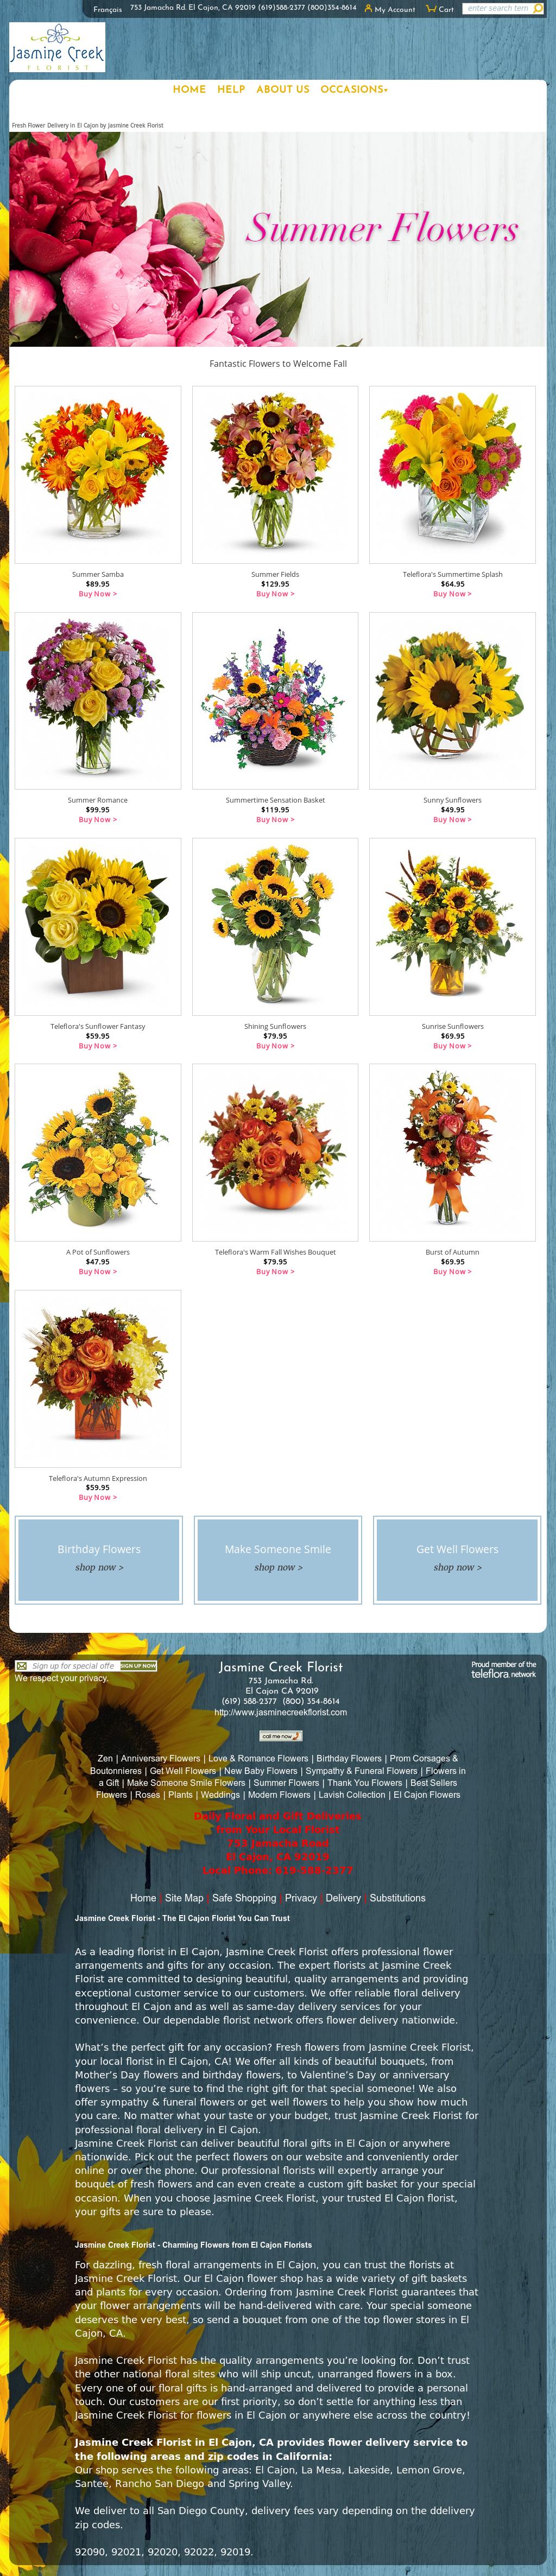 Jasmine Creek Florist Competitors Revenue And Employees Owler